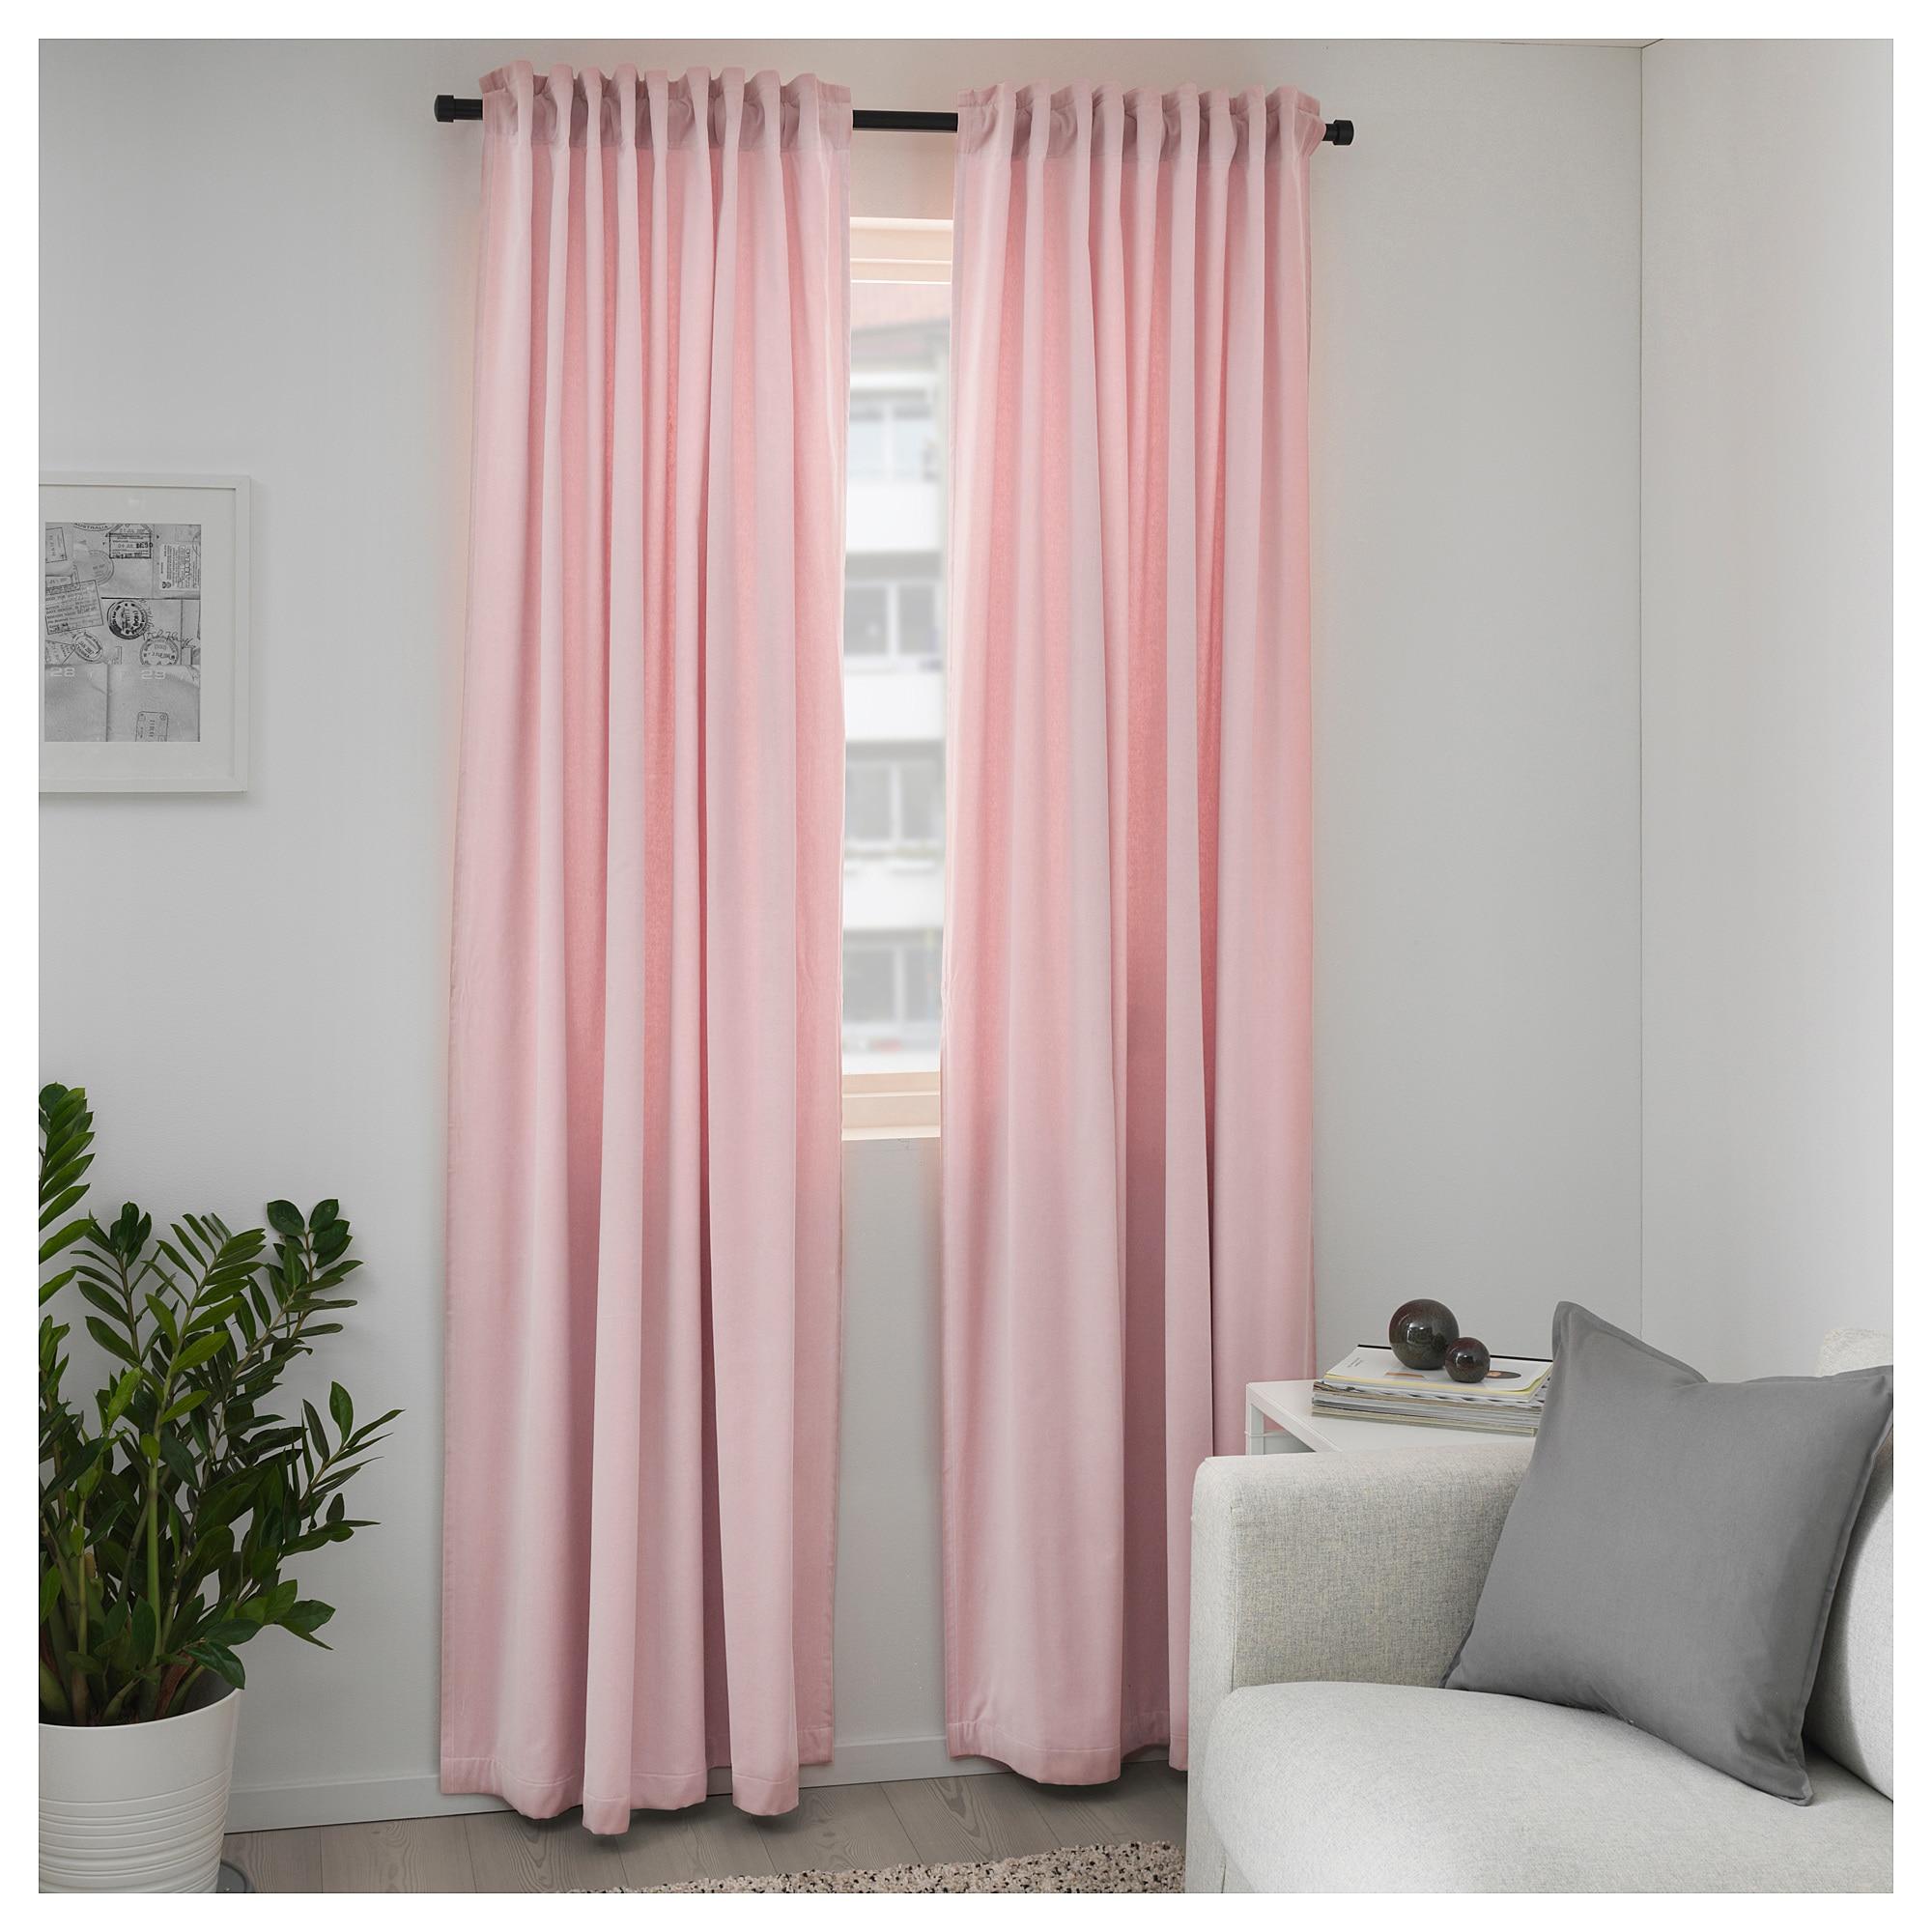 Ikea Sanela Room Darkening Curtains 1 Pair Light Pink Living